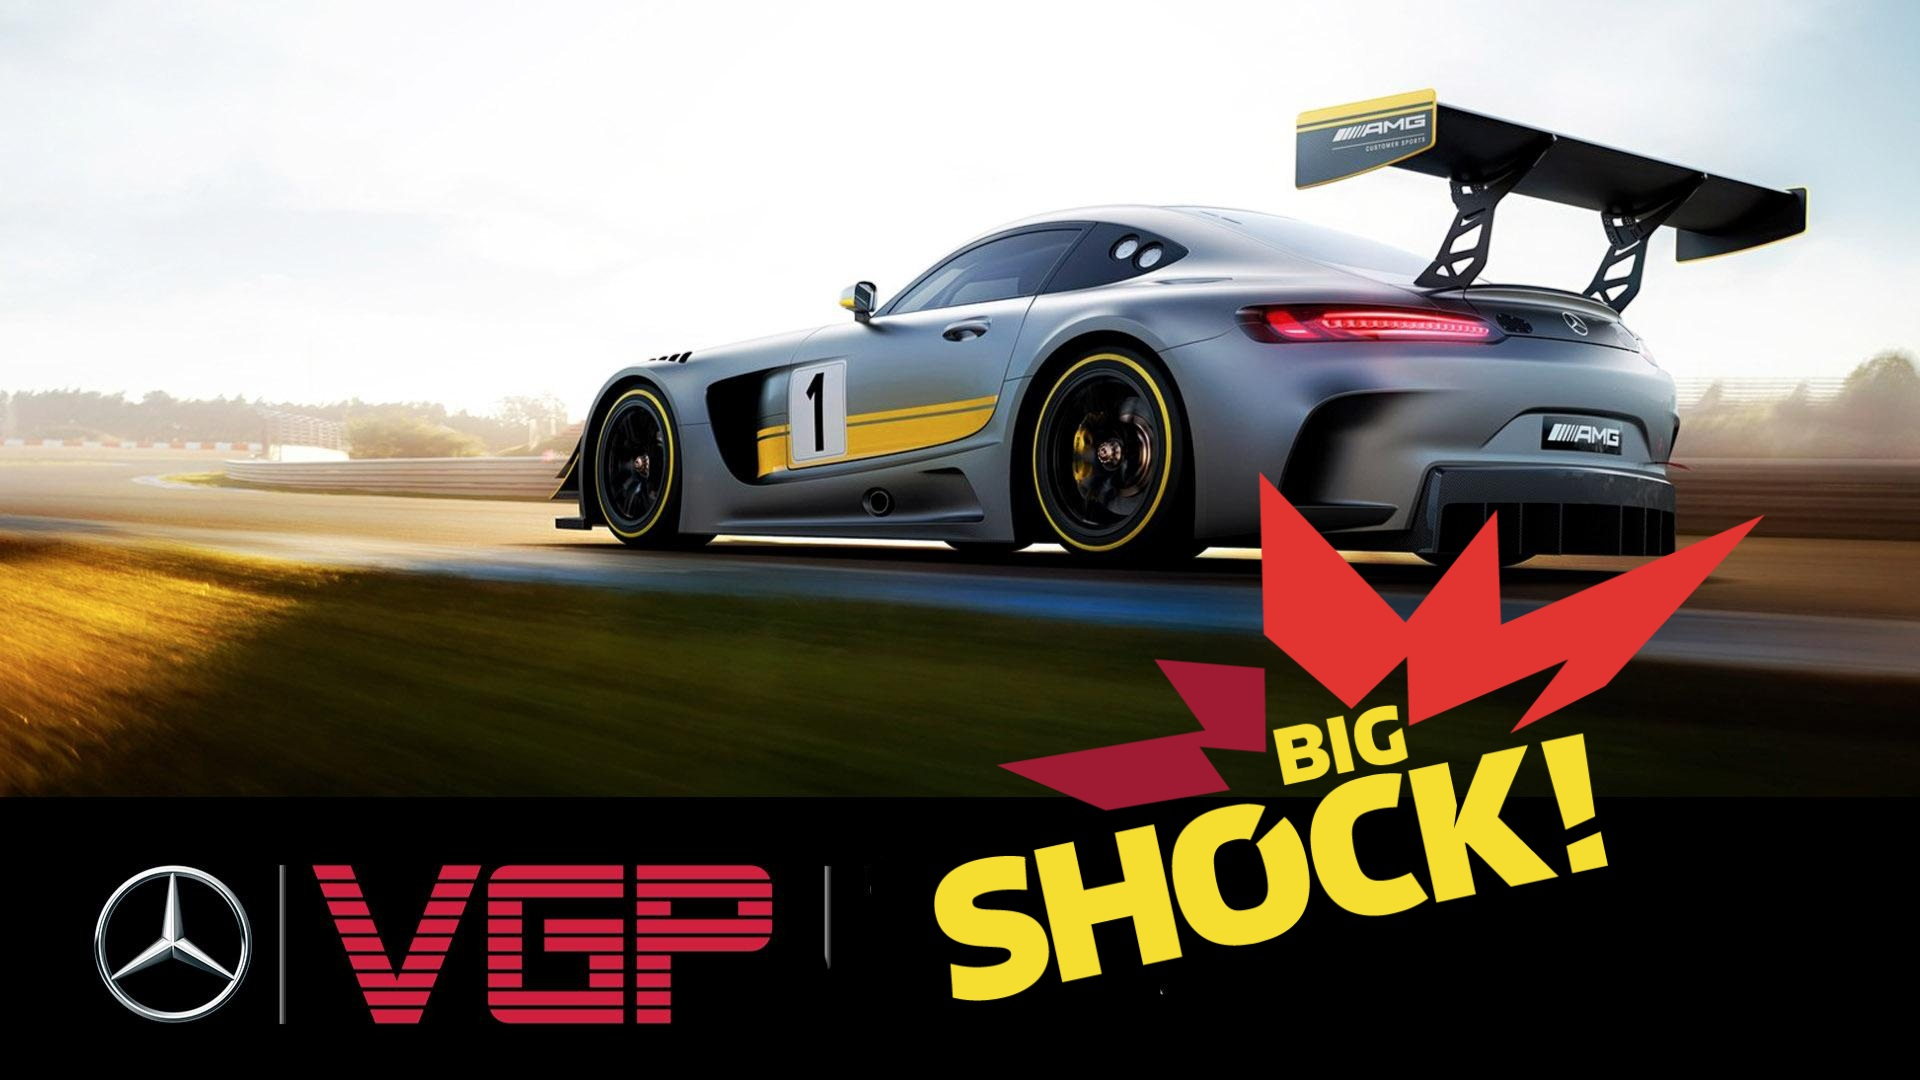 Rozhovor: Ohlédnutí za sezónou Virtual GP 2020 s týmem BigShock Energy